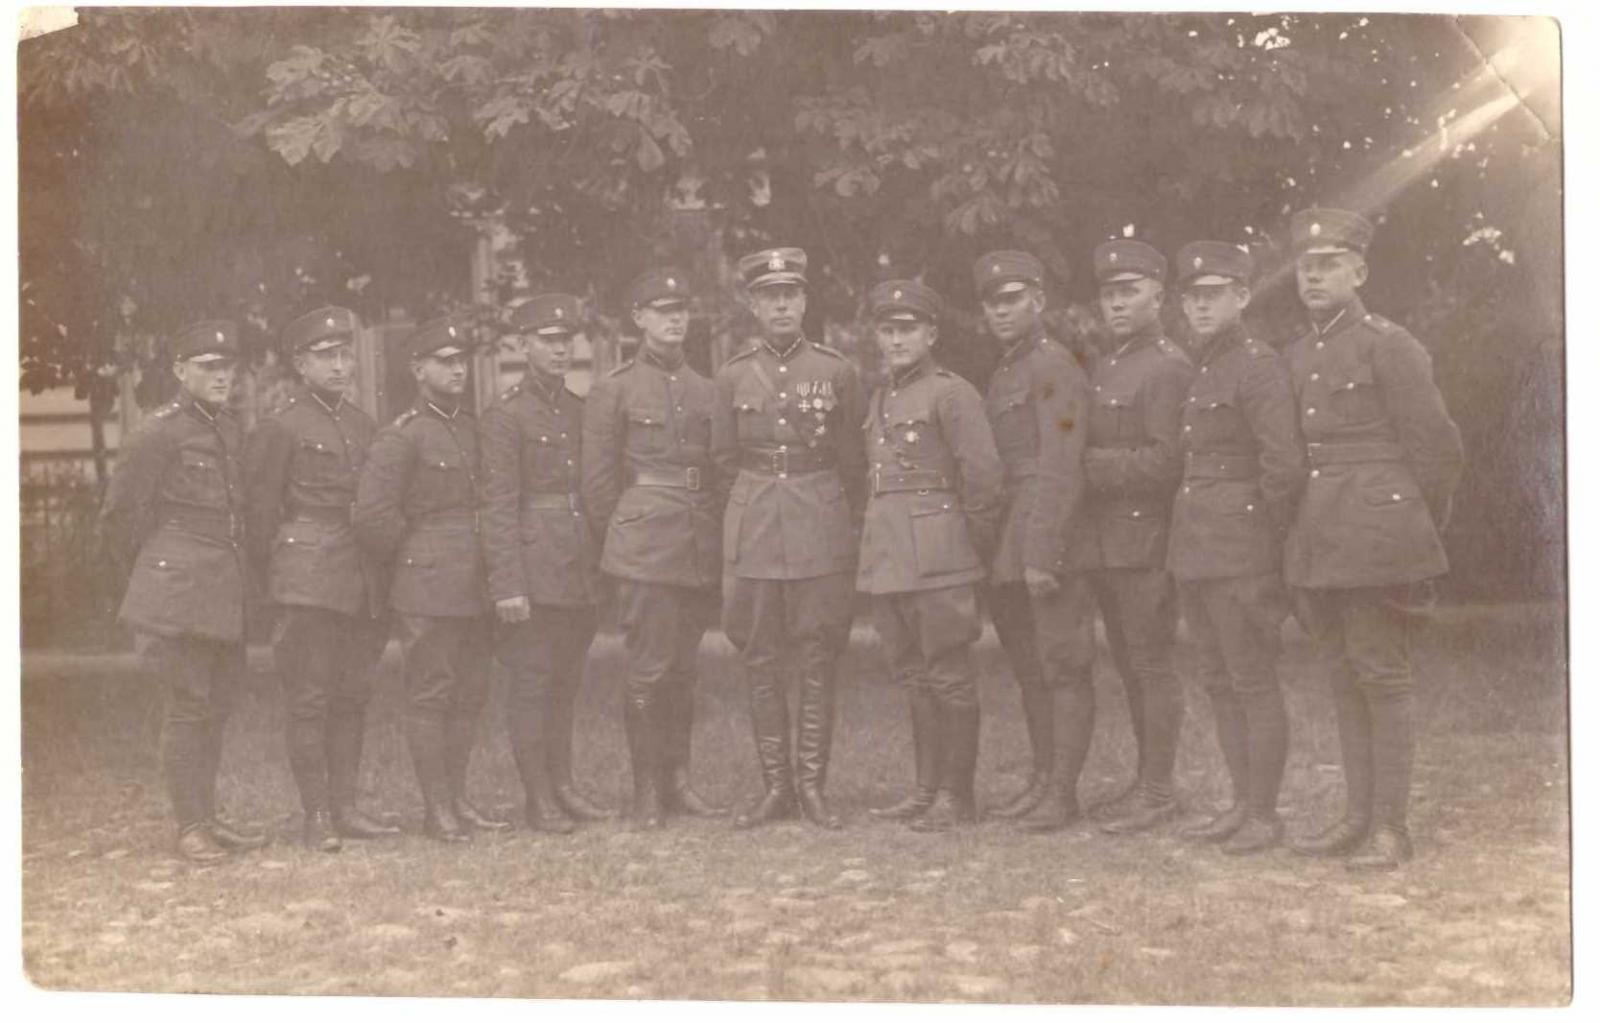 Офицер Латышского легиона